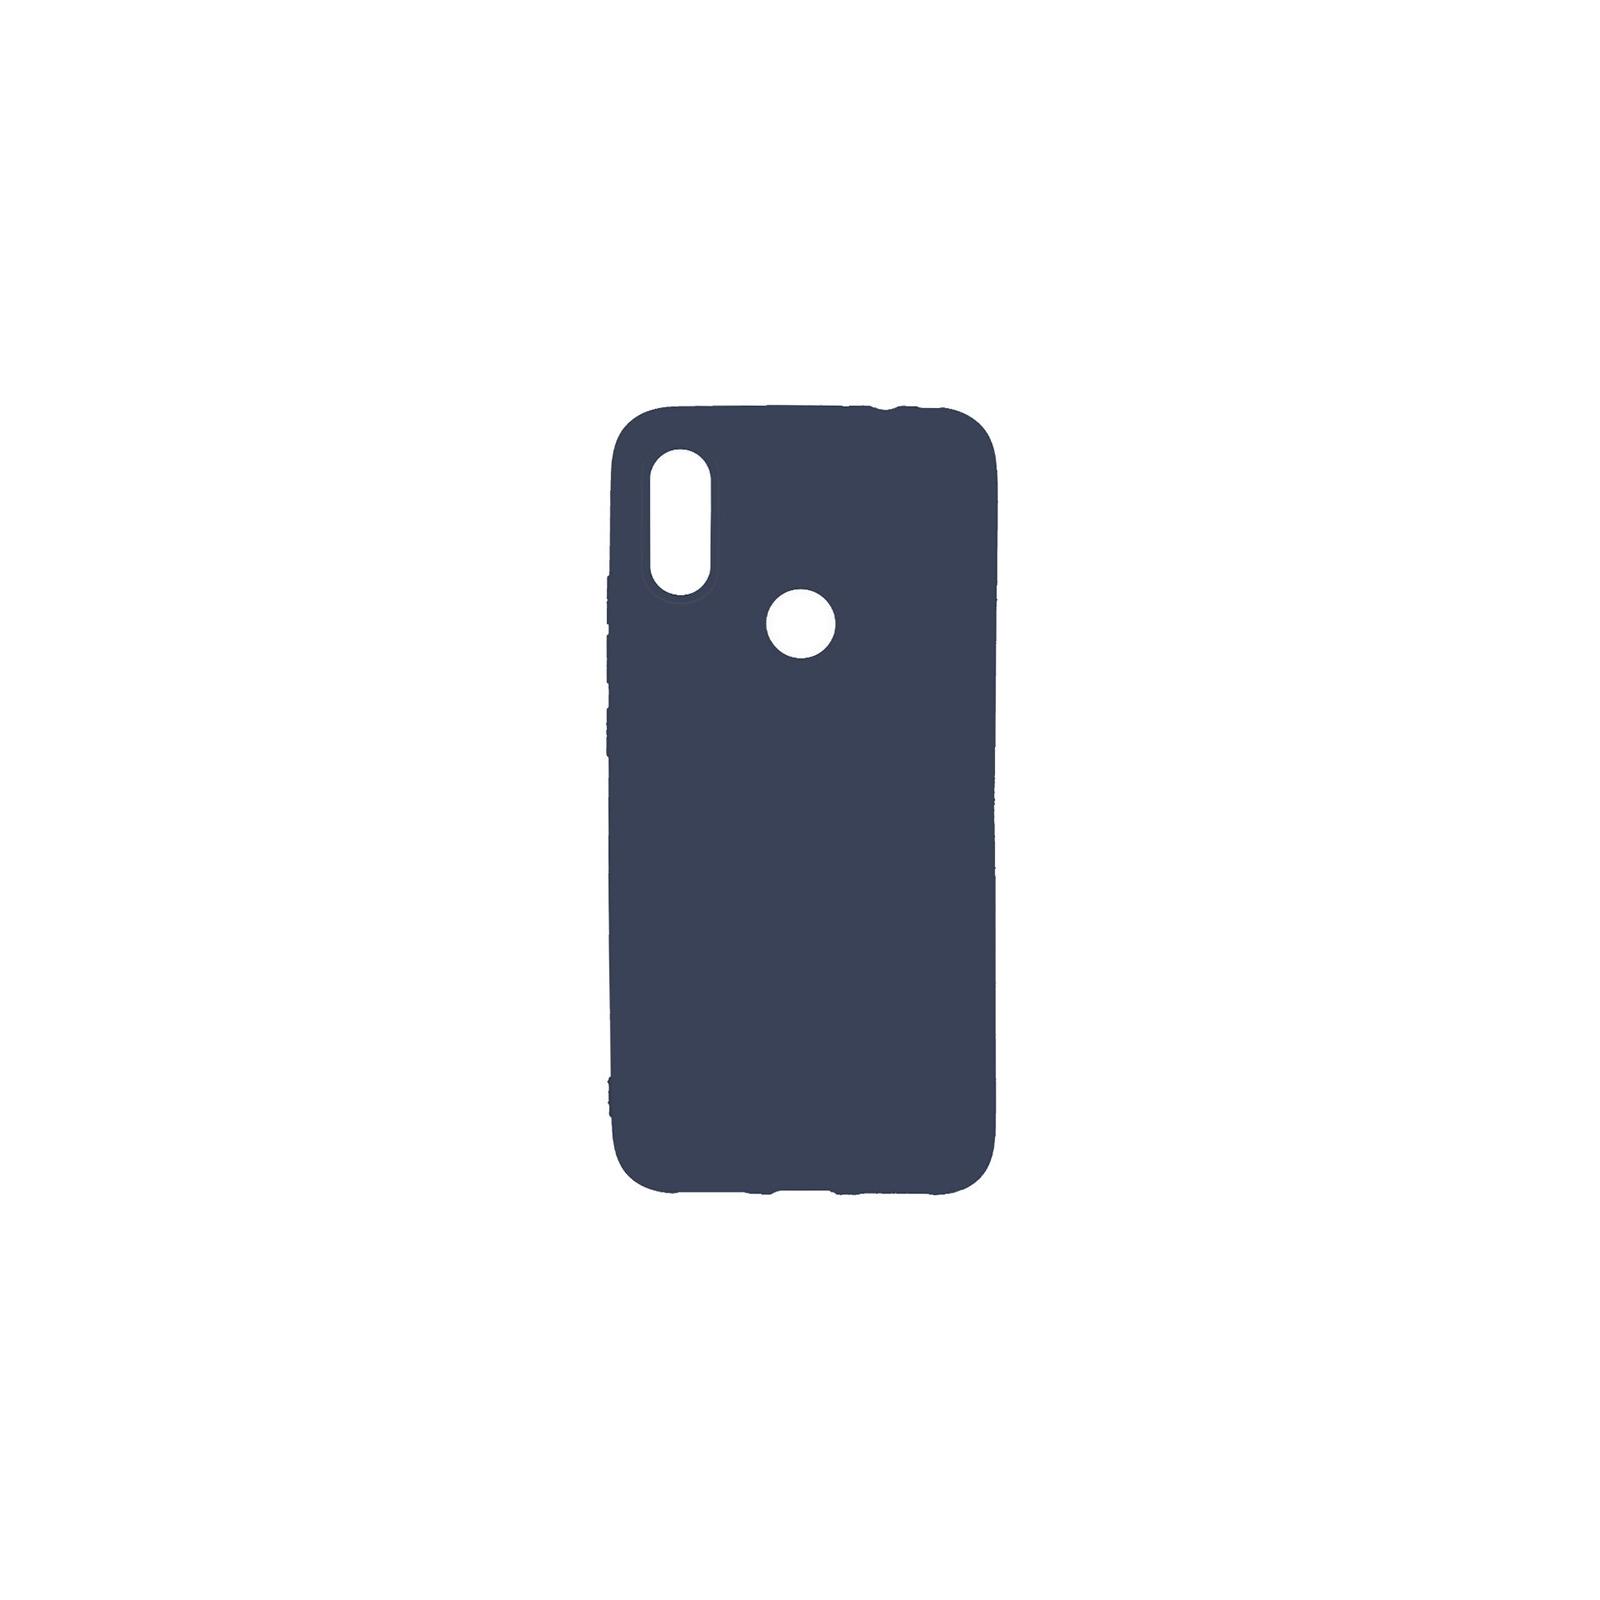 Чехол для моб. телефона Toto 1mm Matt TPU Case Xiaomi Redmi 7 Navy Blue (F_94090)